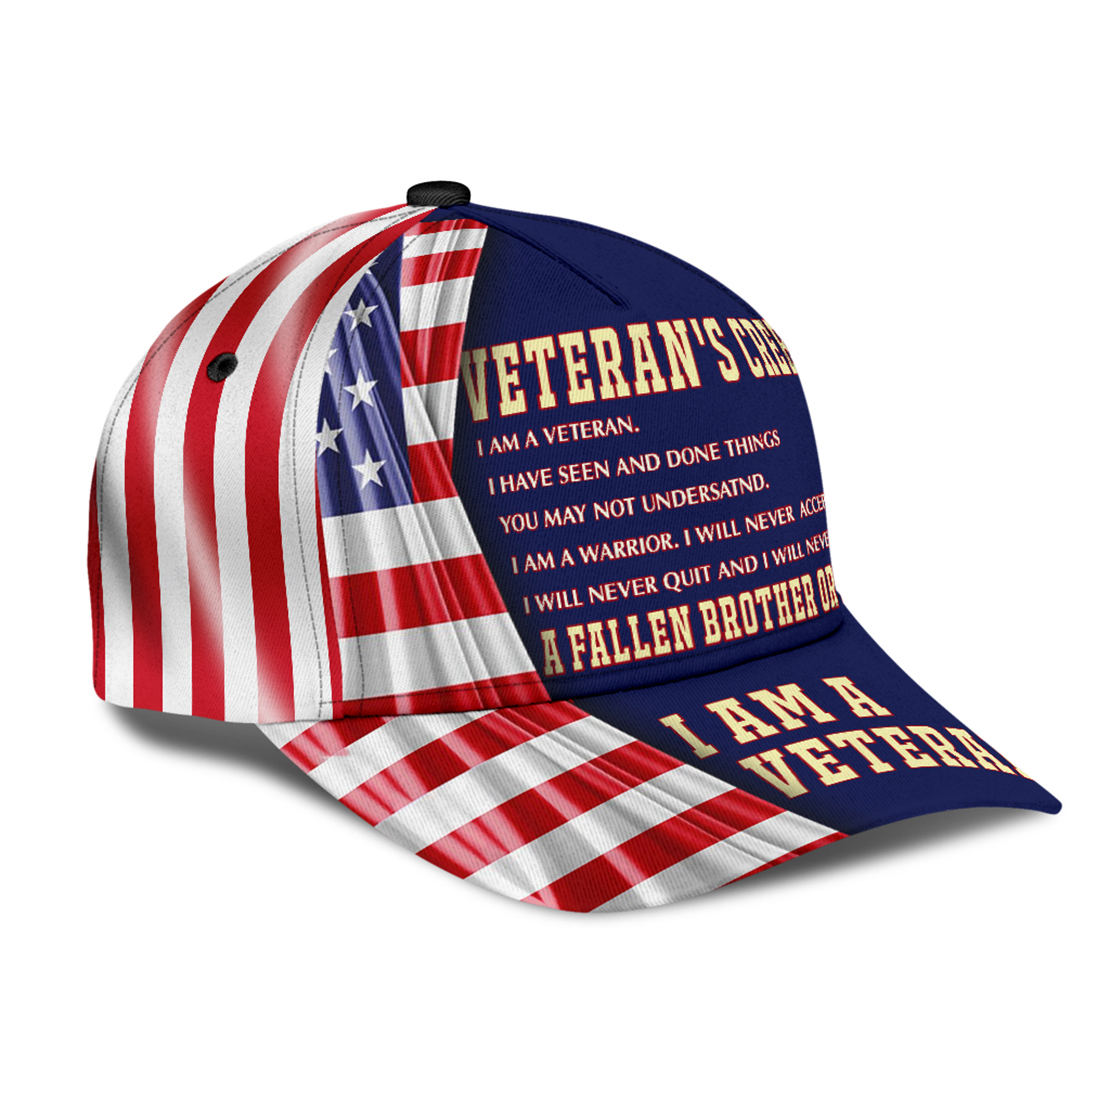 Veteran's creed I am a veteran American flag cap hat